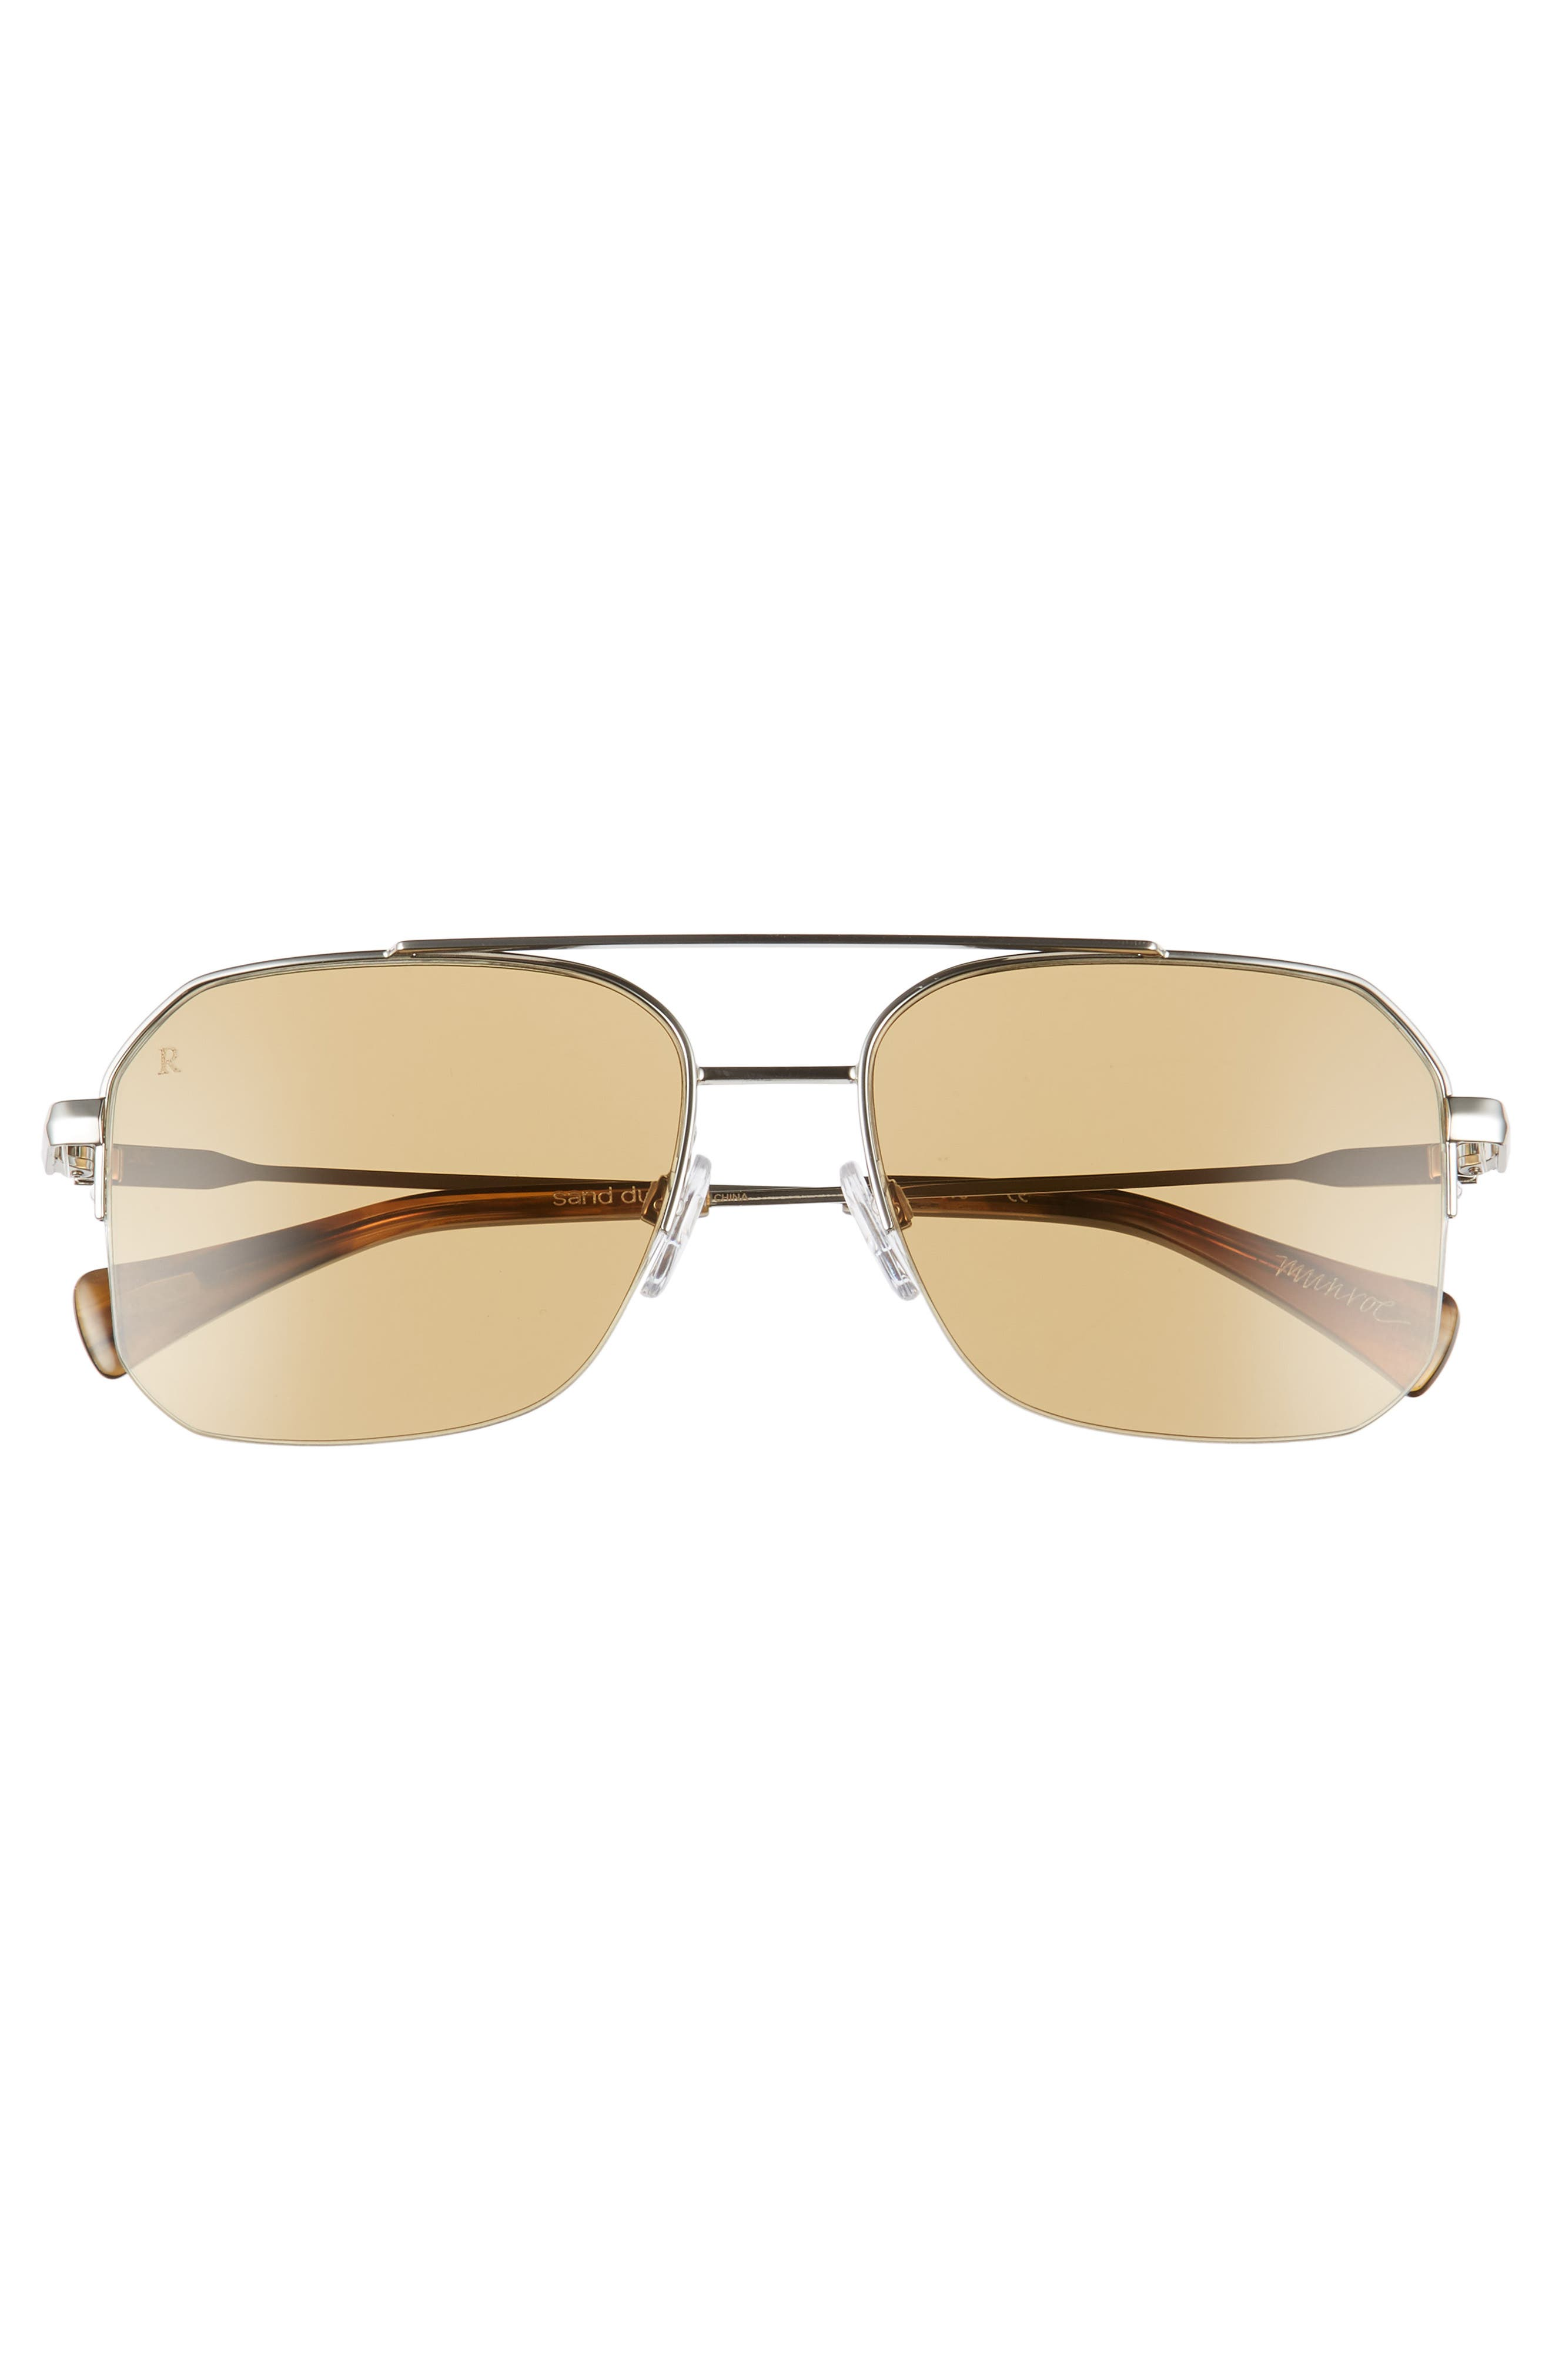 Munroe 55mm Square Aviator Sunglasses,                             Alternate thumbnail 2, color,                             SAND DUNE